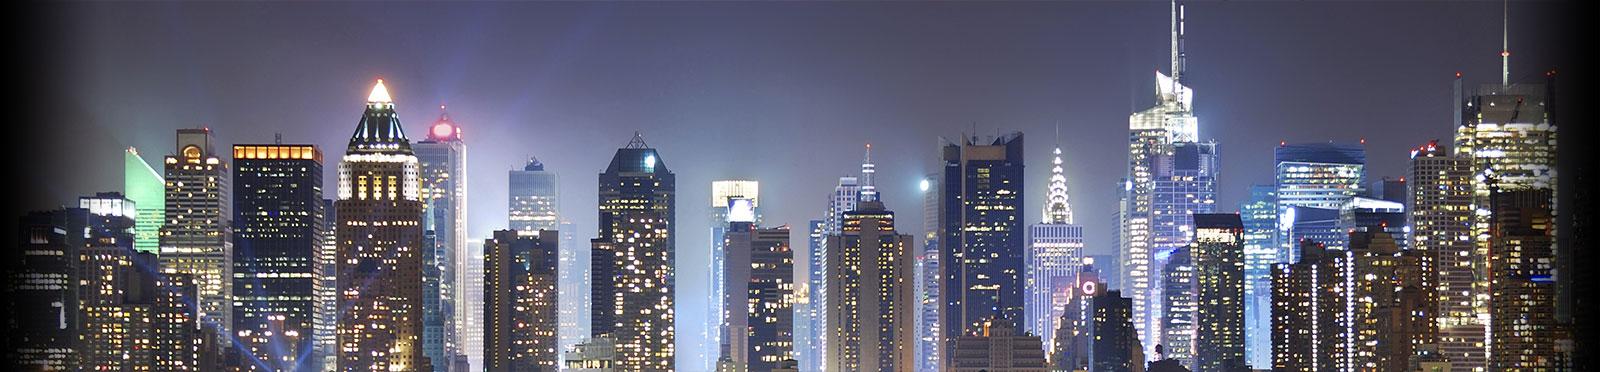 New York City Vacation Rentals and Apartment Rentals FlipKey